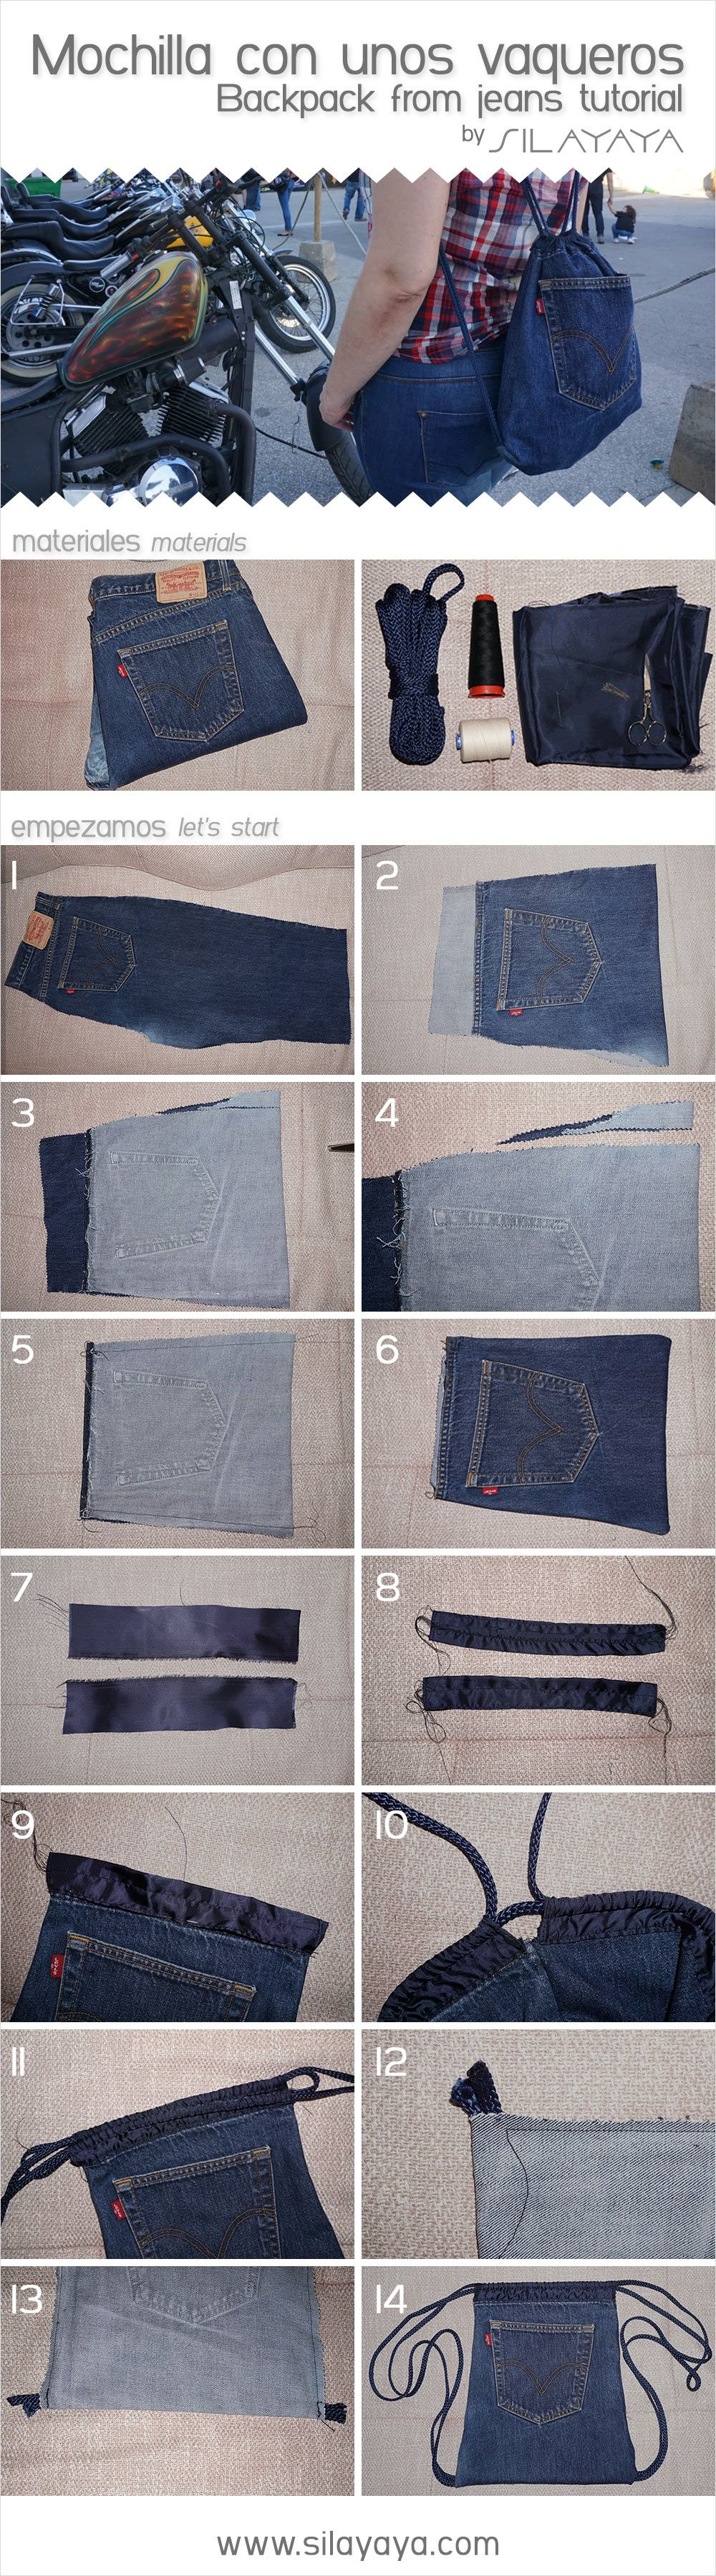 19d44746f tutorial_mochila_vaquera_jeans_backpack Bolso Vaquero Reciclado, Ropa  Reciclada, Jeans Viejos, Mochilas De Jeans, Como